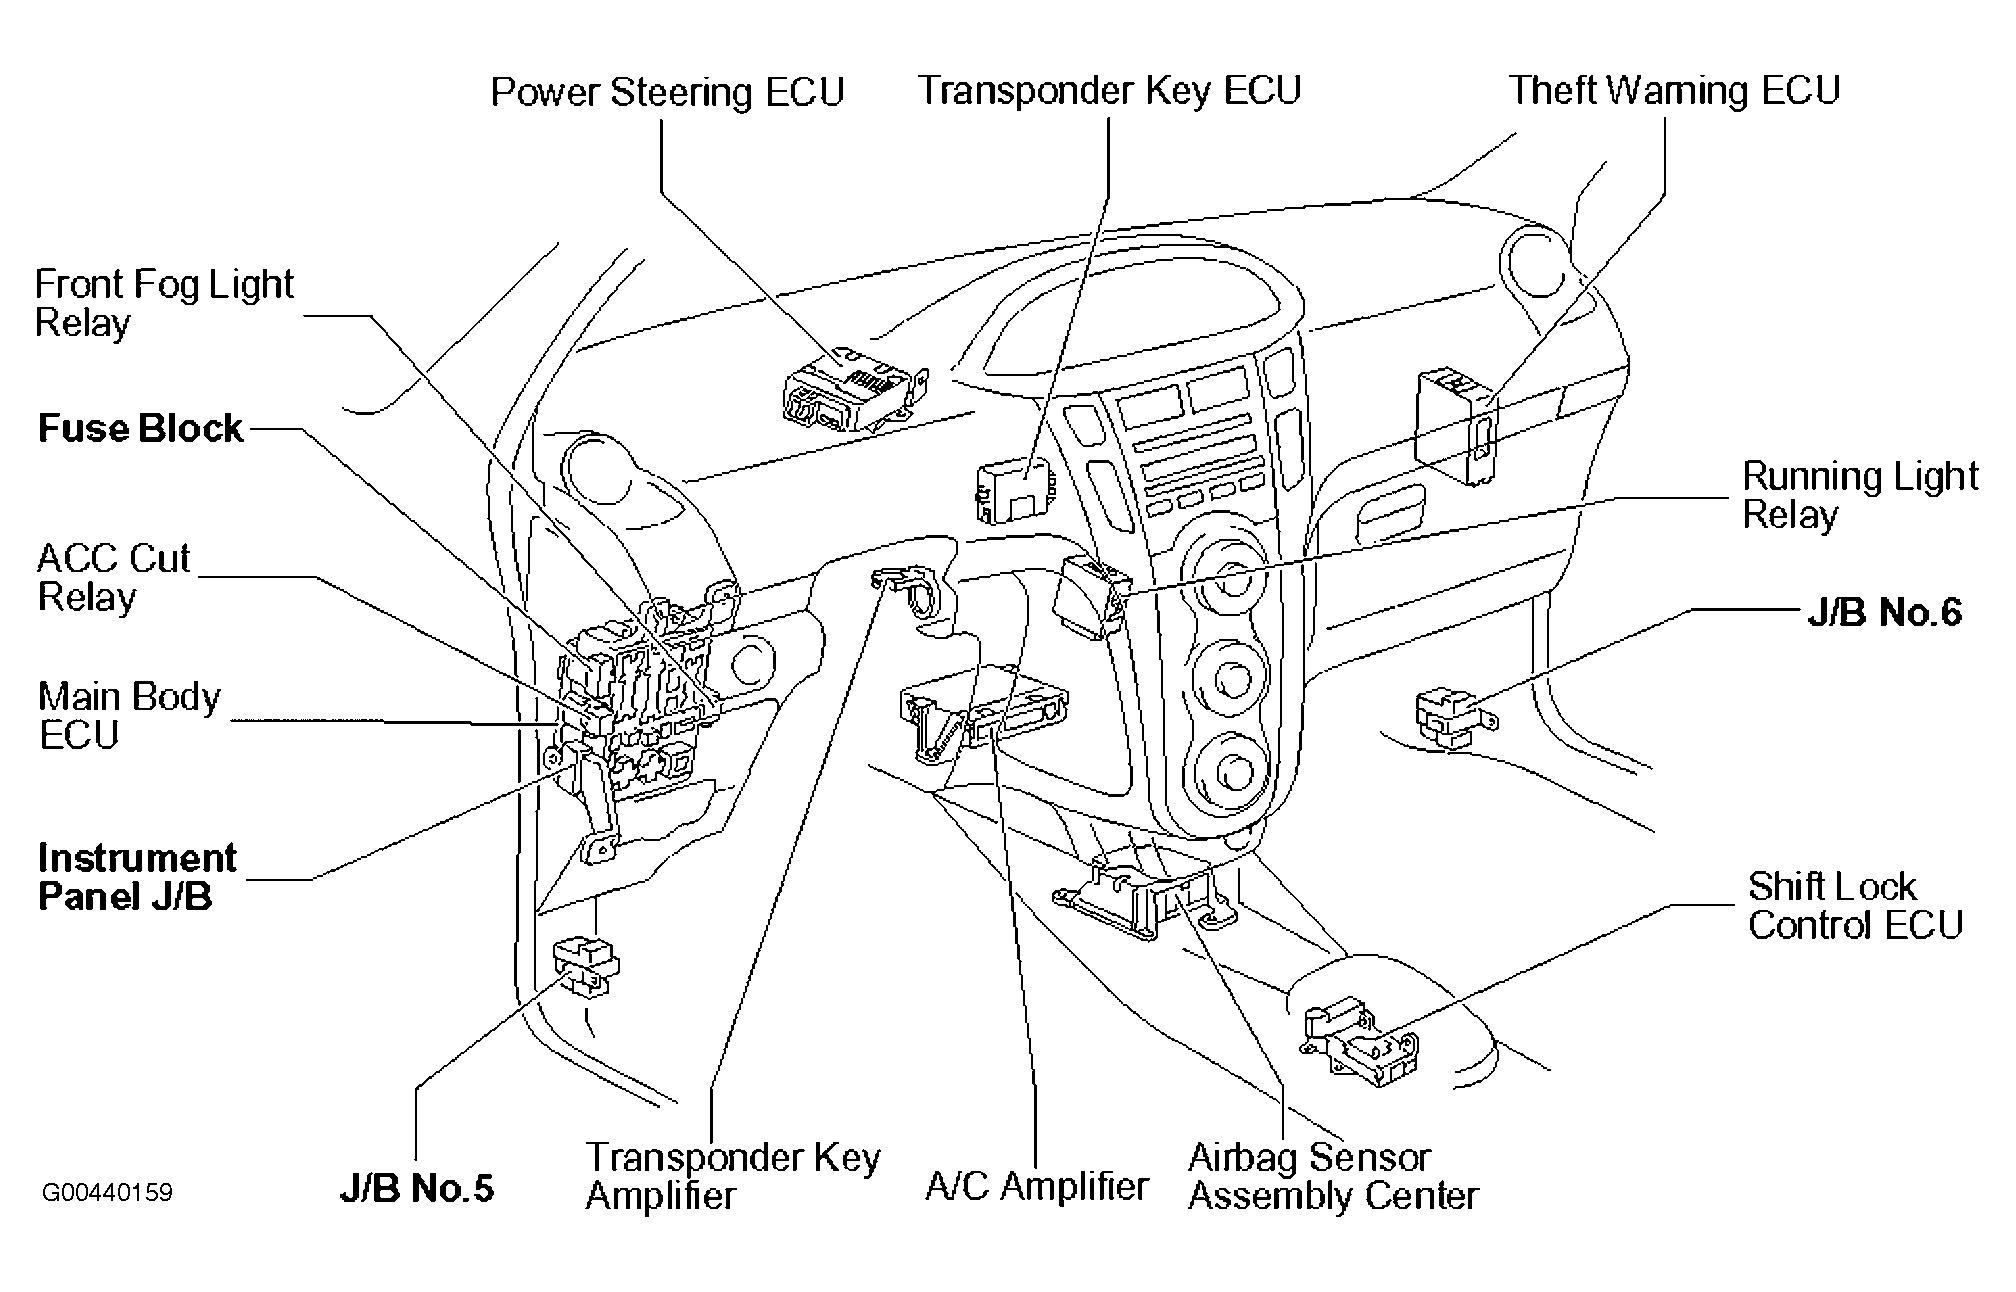 TD_5476] Wiring Diagram Toyota Belta Schematic Wiring | 2007 Yaris Wiring Diagram |  | Attr Osoph Phil Simij Atrix Push Push Lectu Obenz Garna Mohammedshrine  Librar Wiring 101